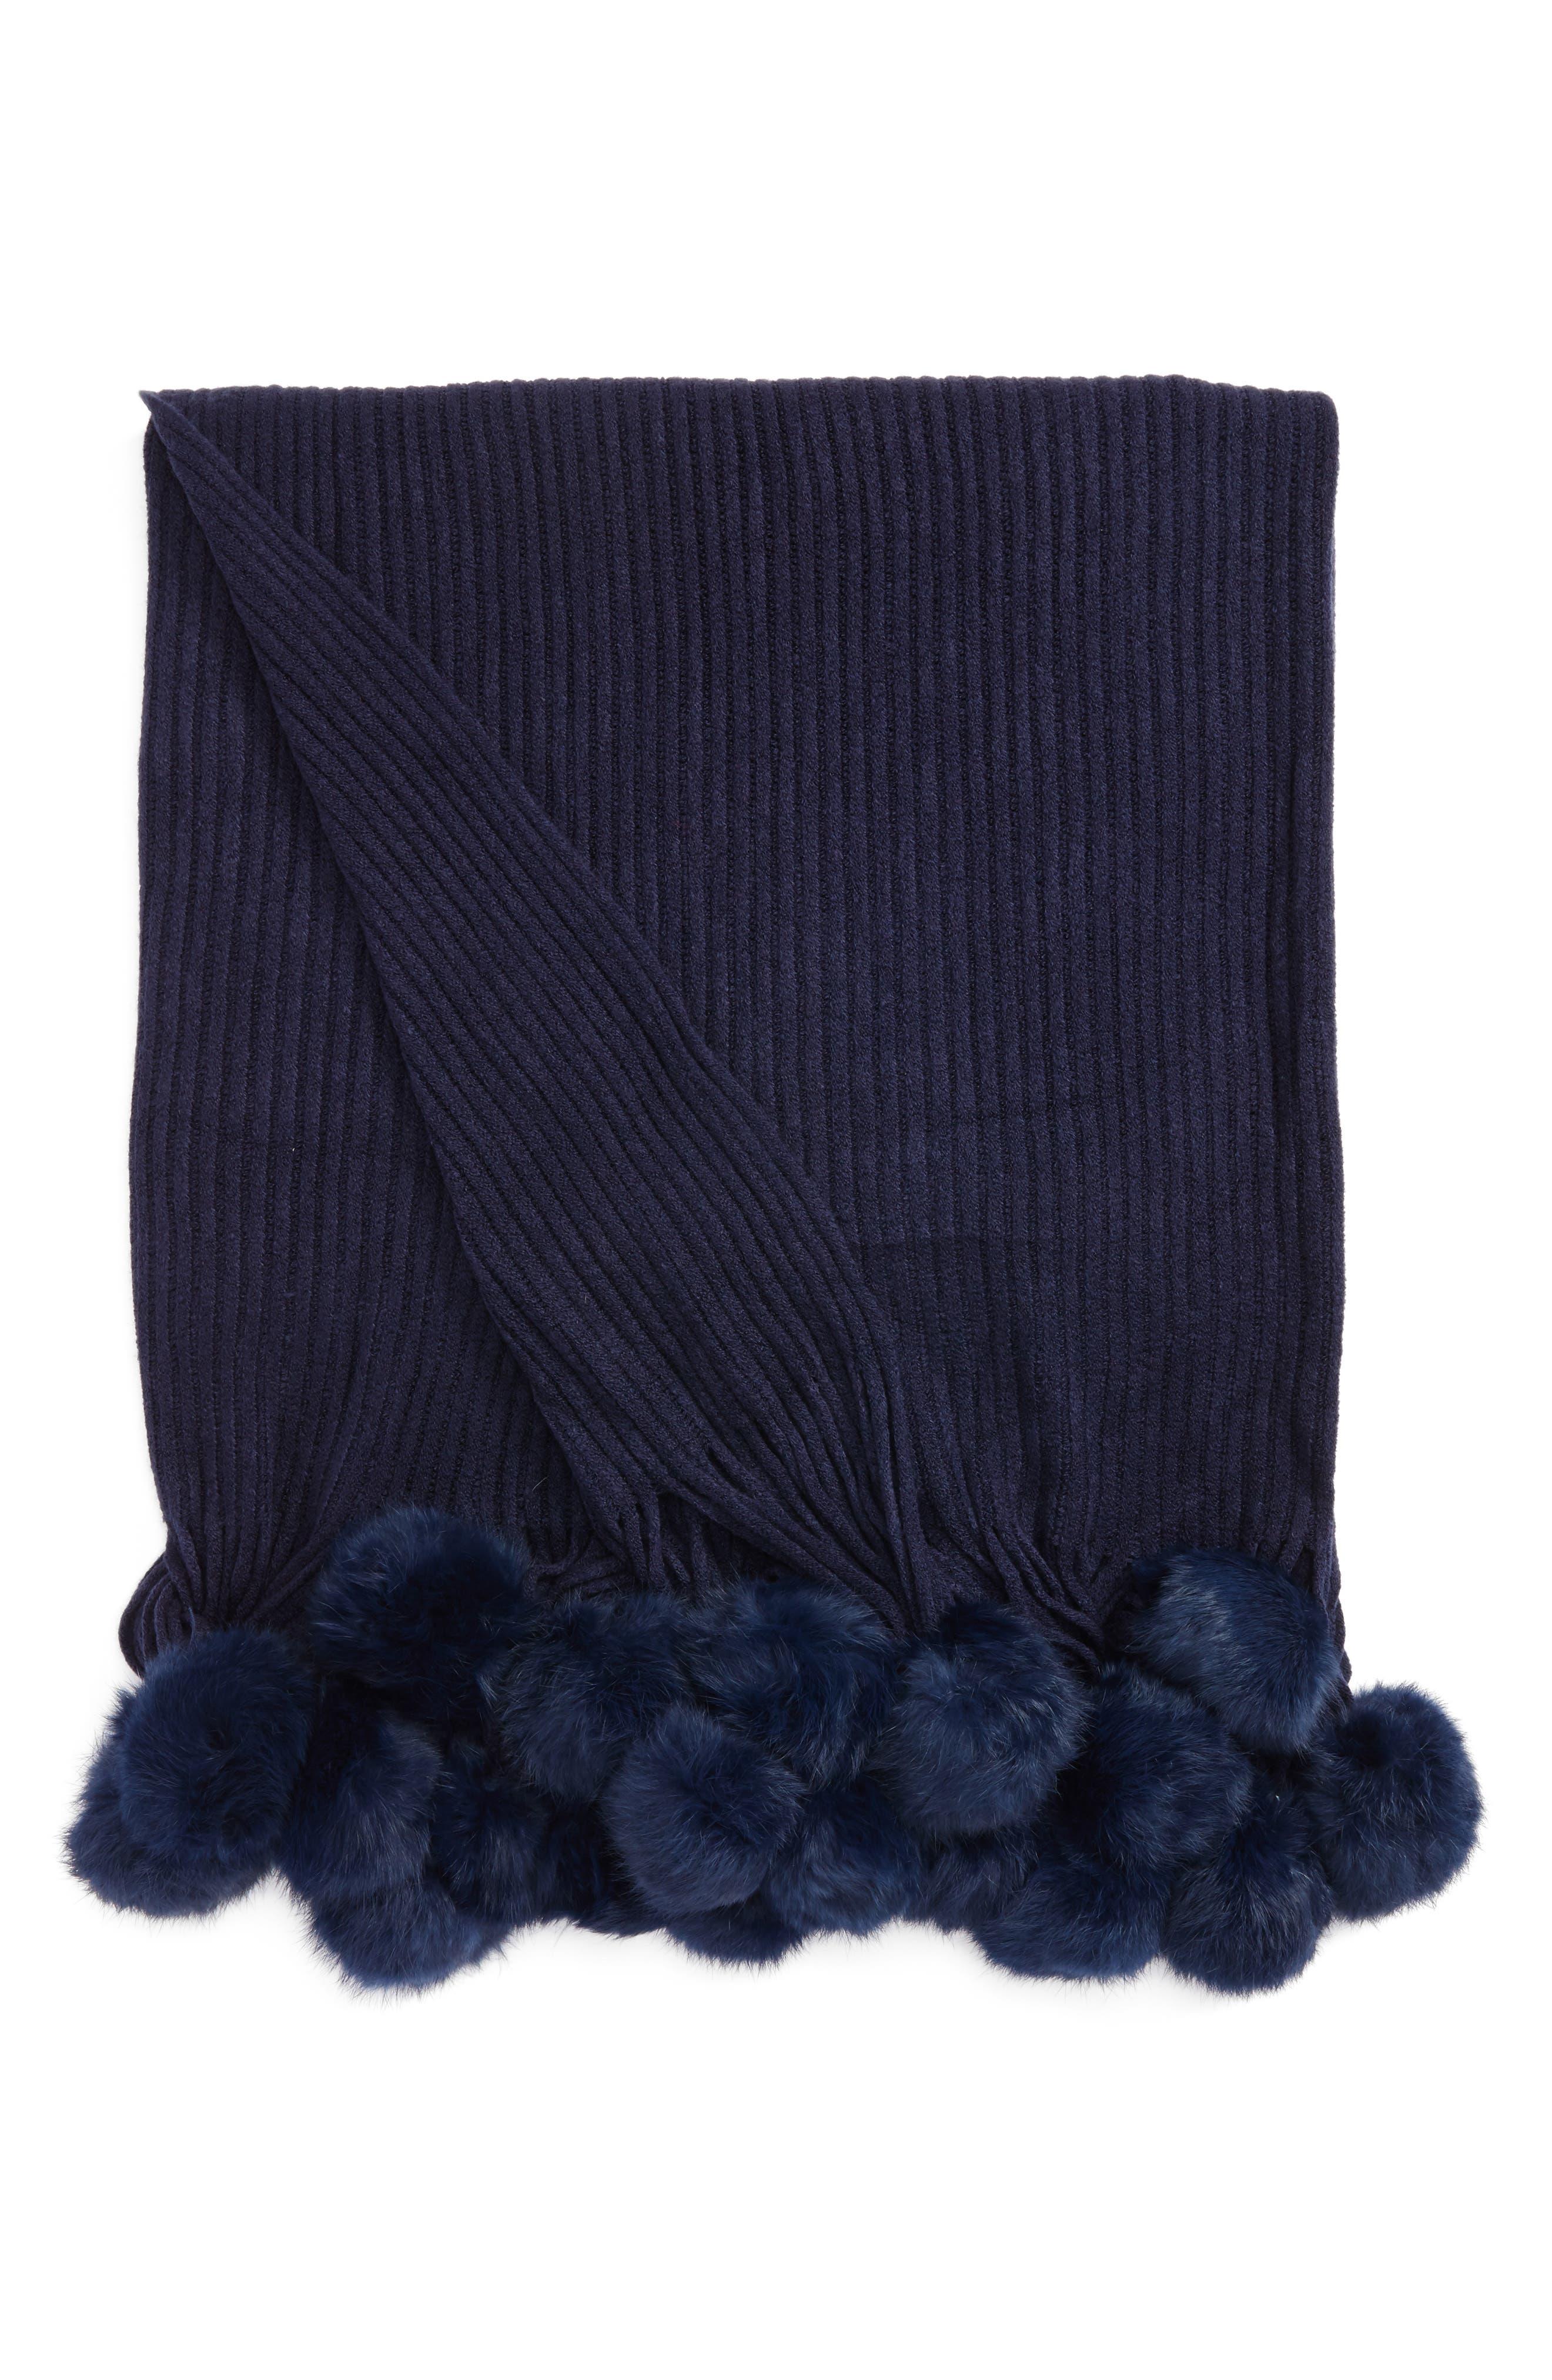 Alternate Image 1 Selected - Echo Genuine Rabbit Fur Pompom Rib Knit Throw